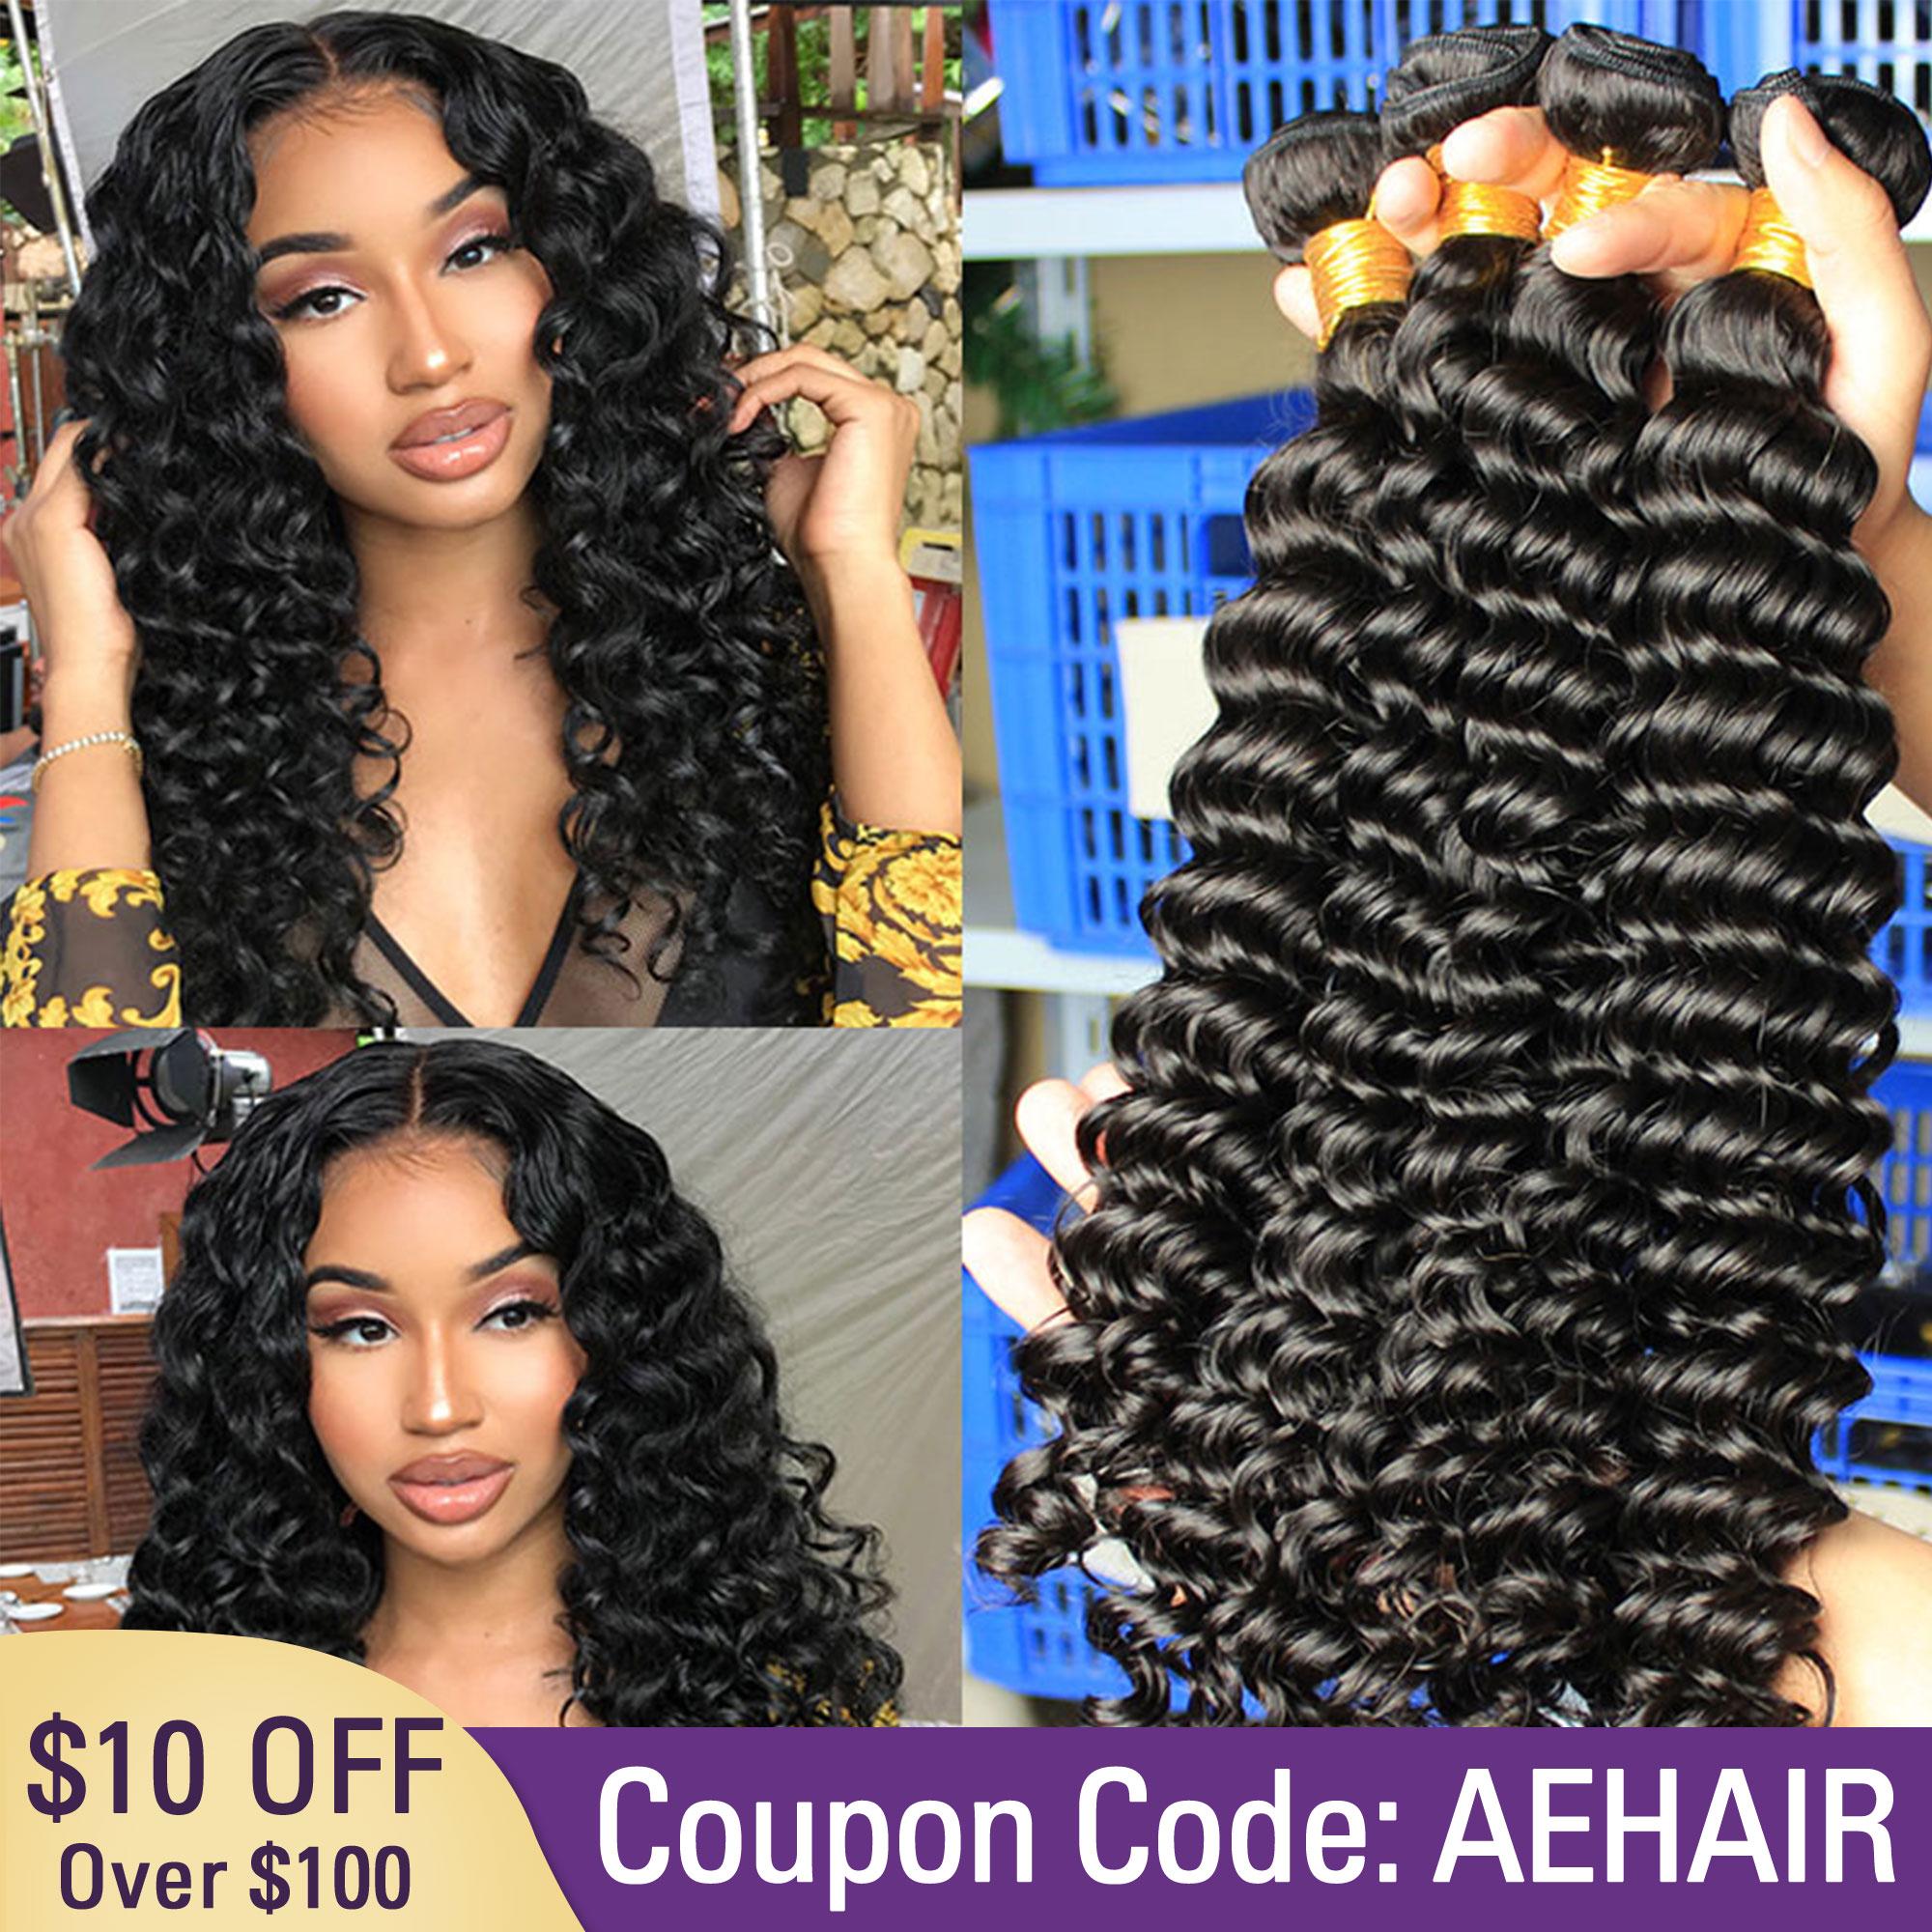 Deep Wave Human Hair Bundles With Closure Hair Extensions Brazilian Virgin Hair Weave Bundles Loose Curly Ever Beauty Product